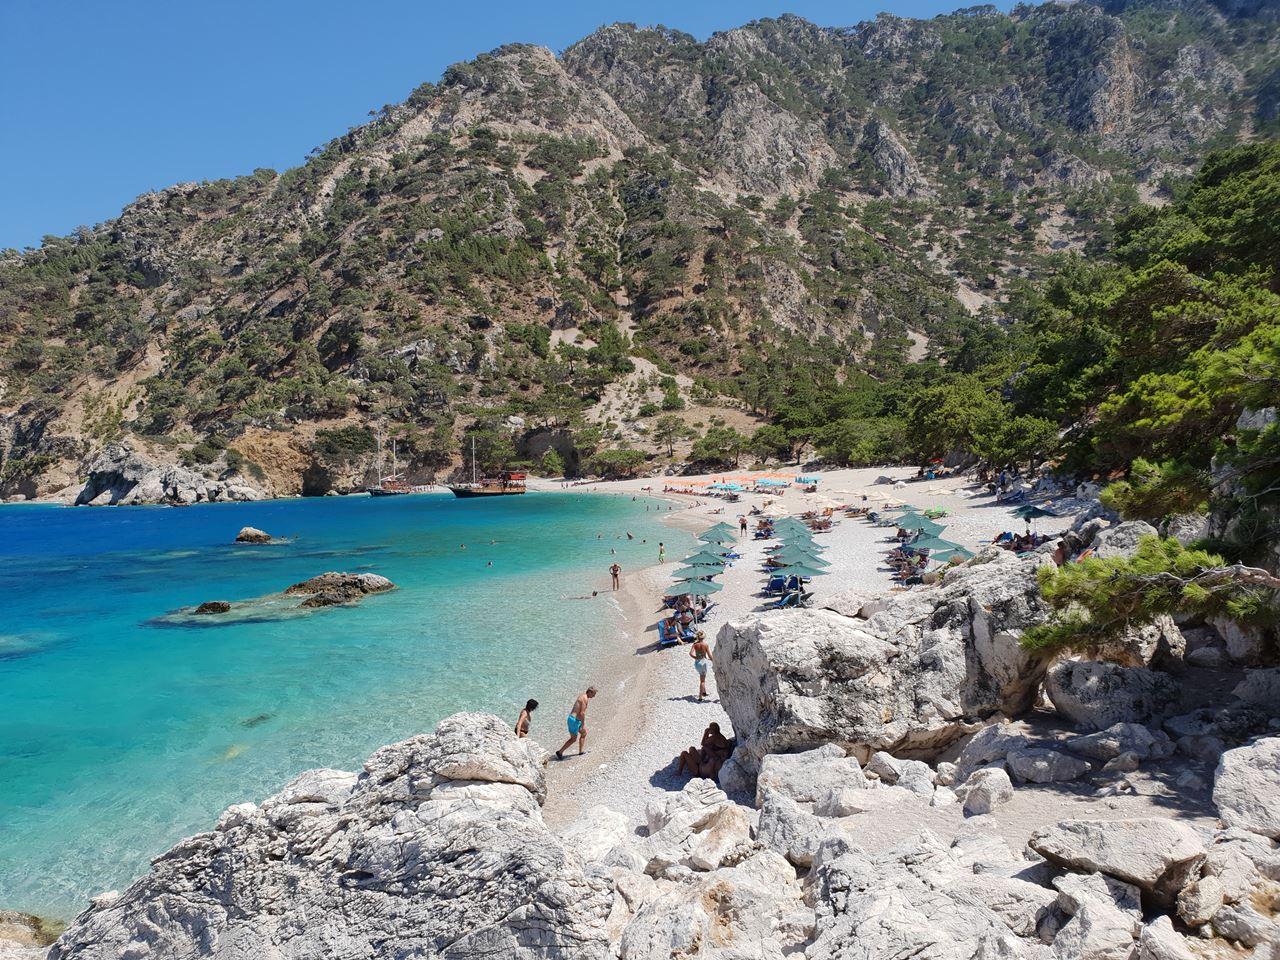 Karpathos Apella Beach Photo: Municipality of Karpathos